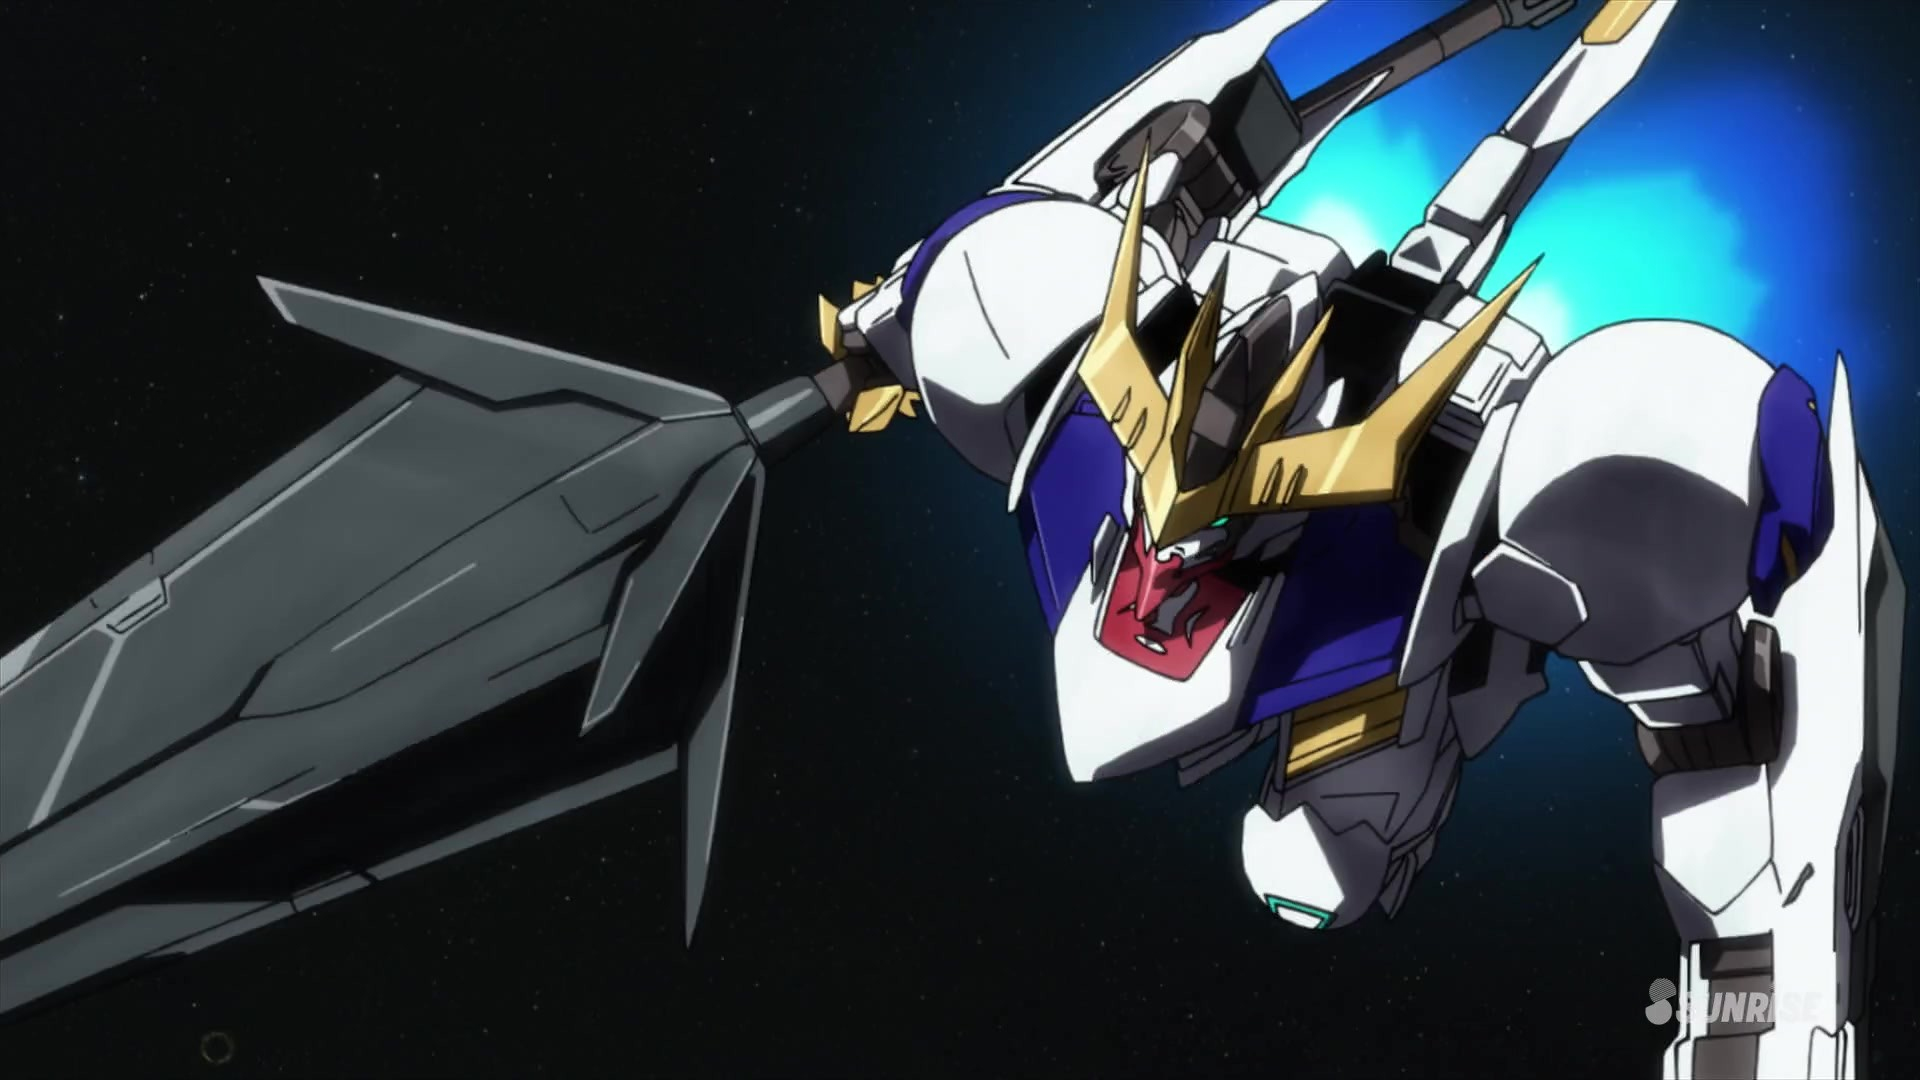 ASW-G-08 Gundam Barbatos Lupus Rex – Mace (episode 42) (2).jpg